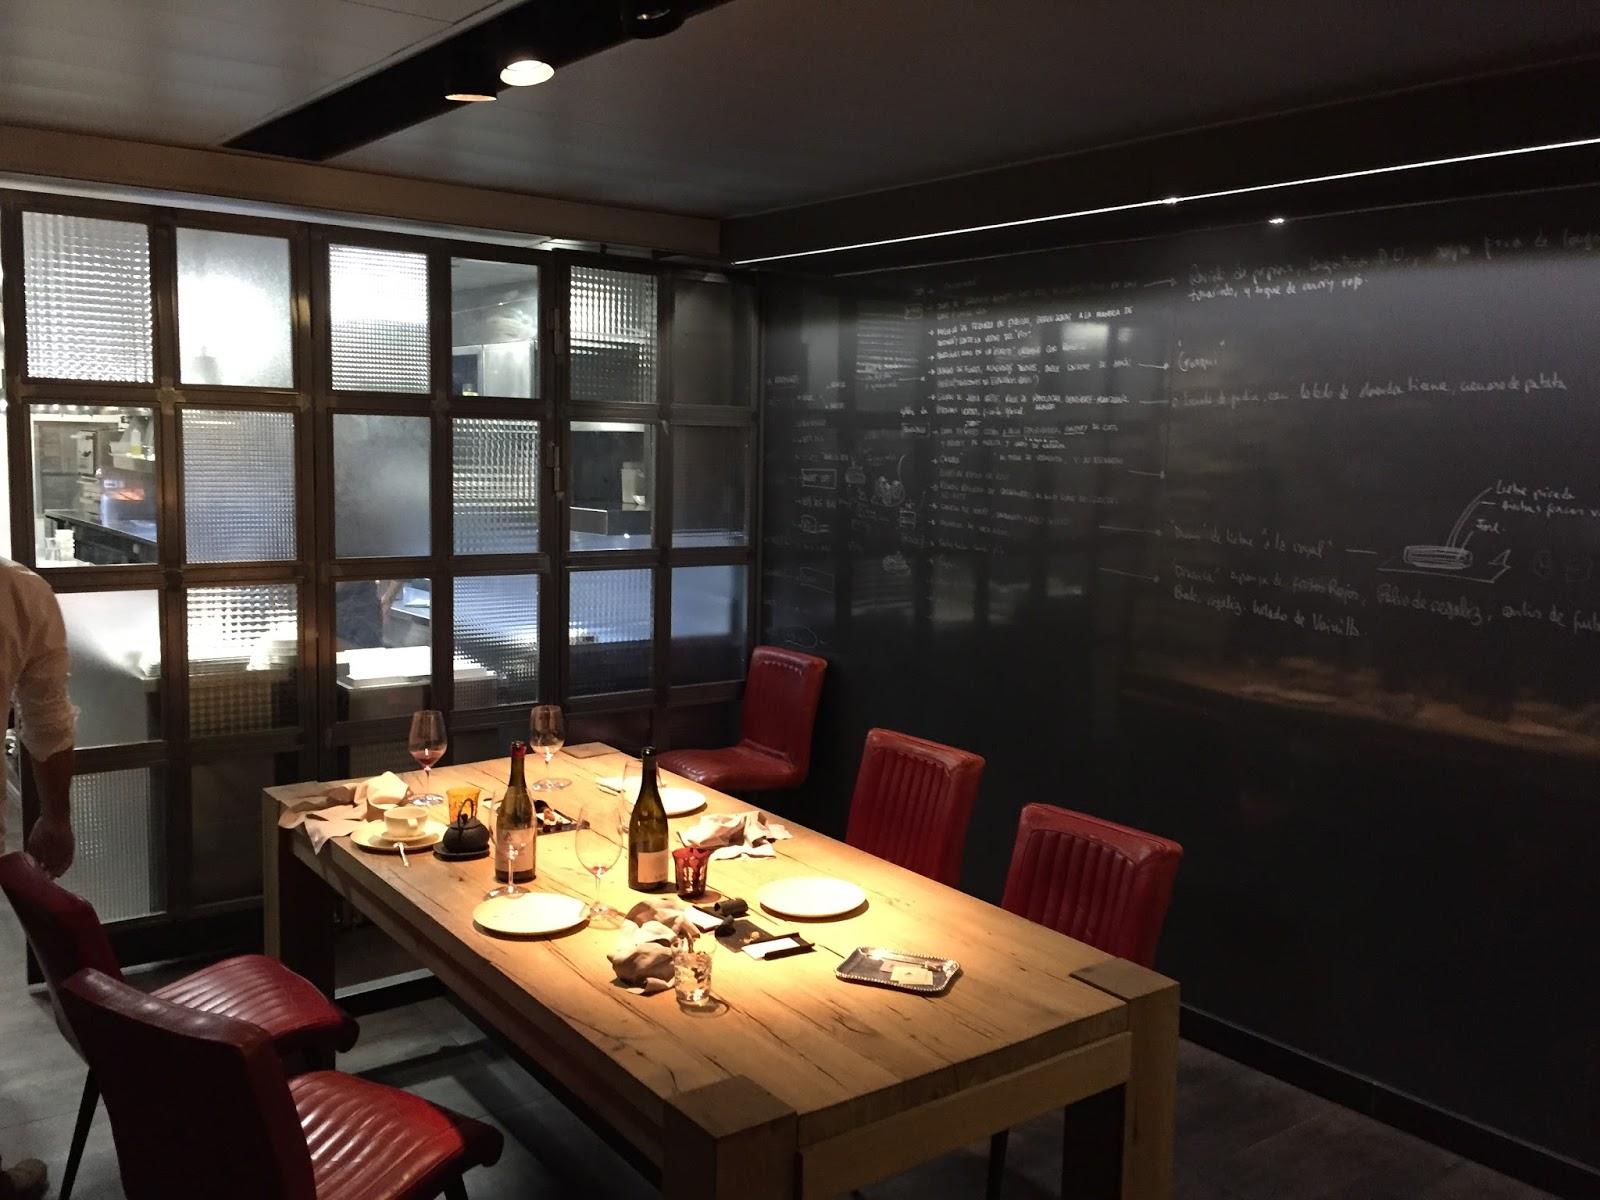 De restaurantes rc sergi arola gastro de familia a familia de restaurantes con estrella - Restaurante de sergi arola ...